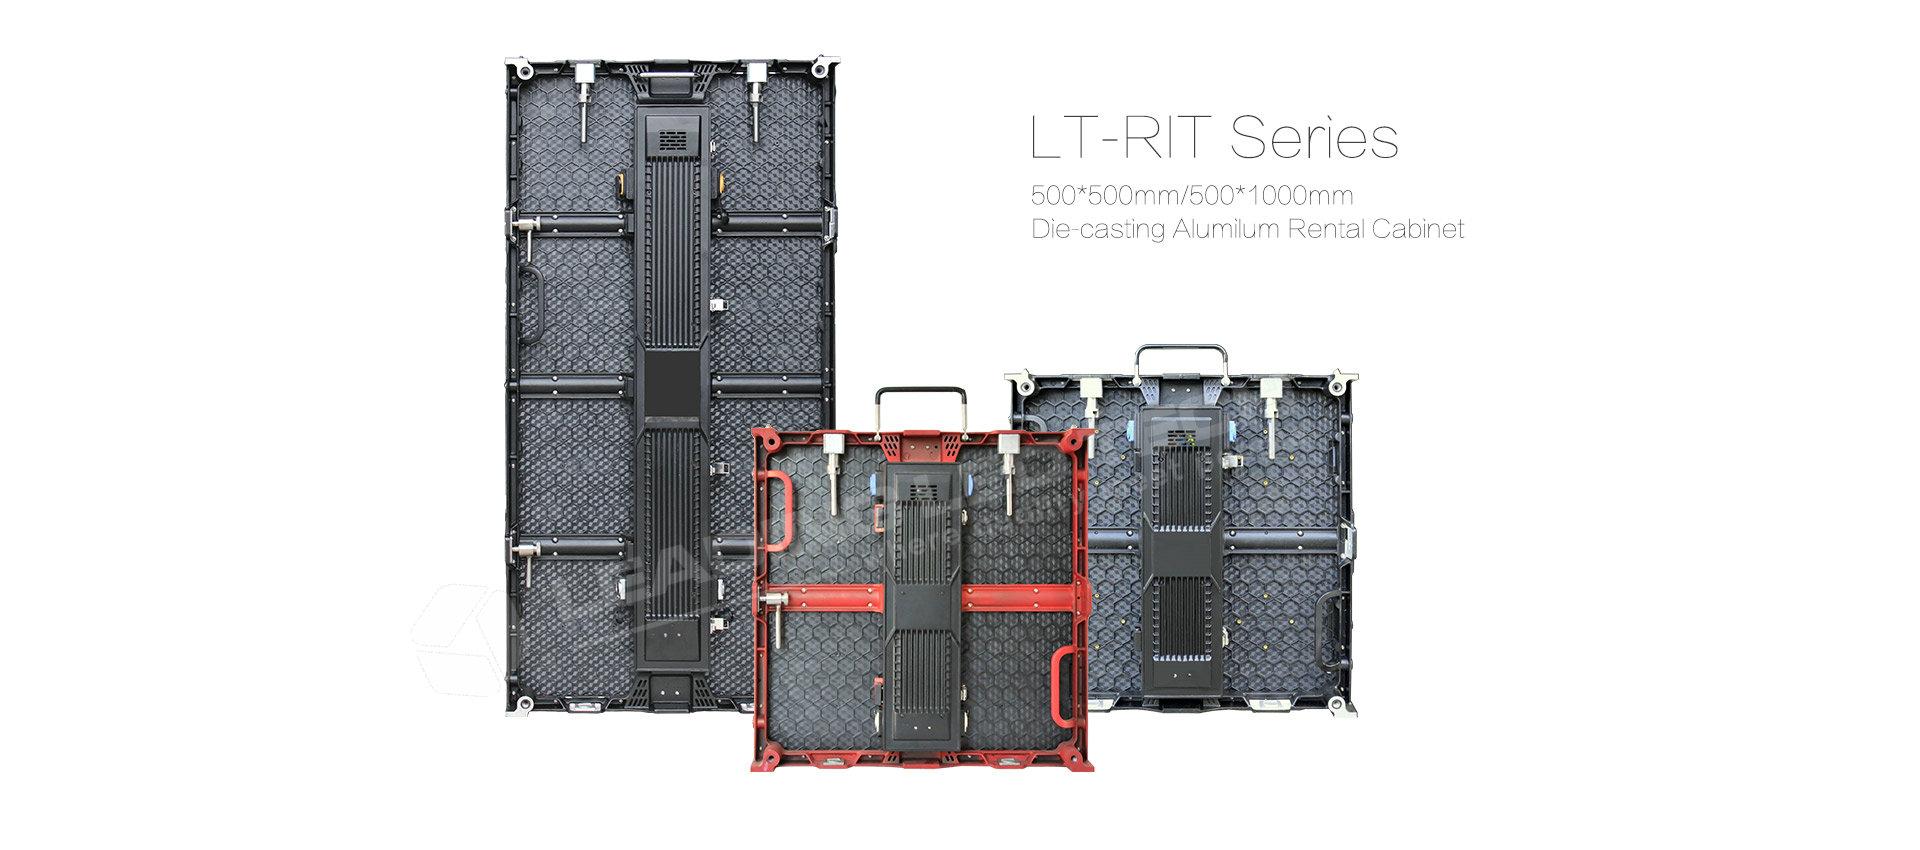 500*500mm, 500*1000mm indoor rental LED cabiinets